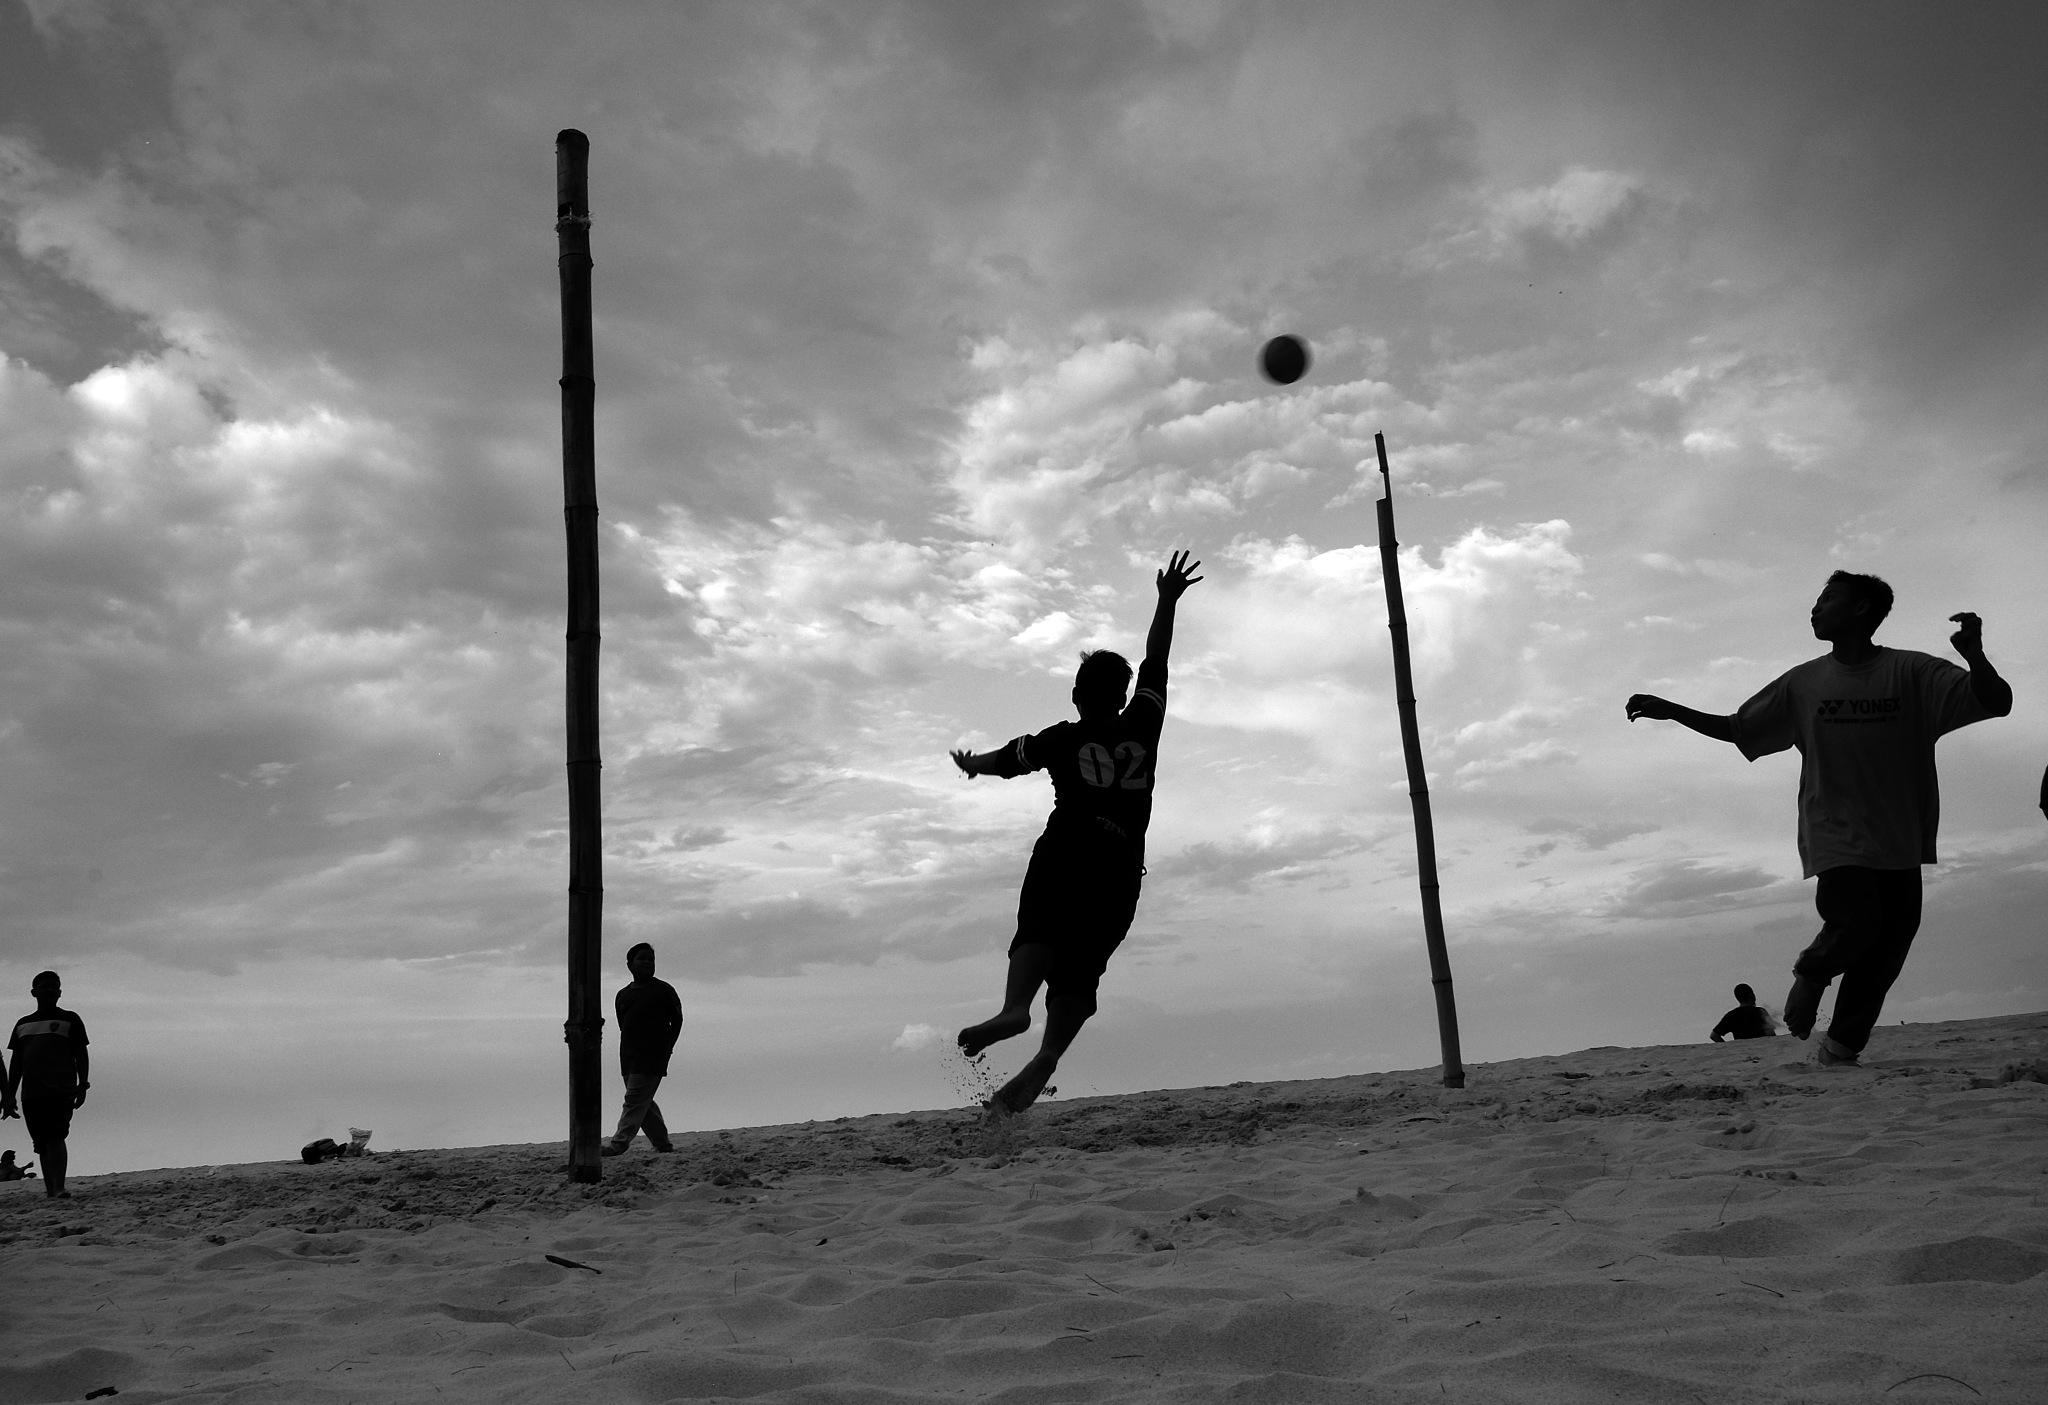 Untitled by Wan Zuharuddin